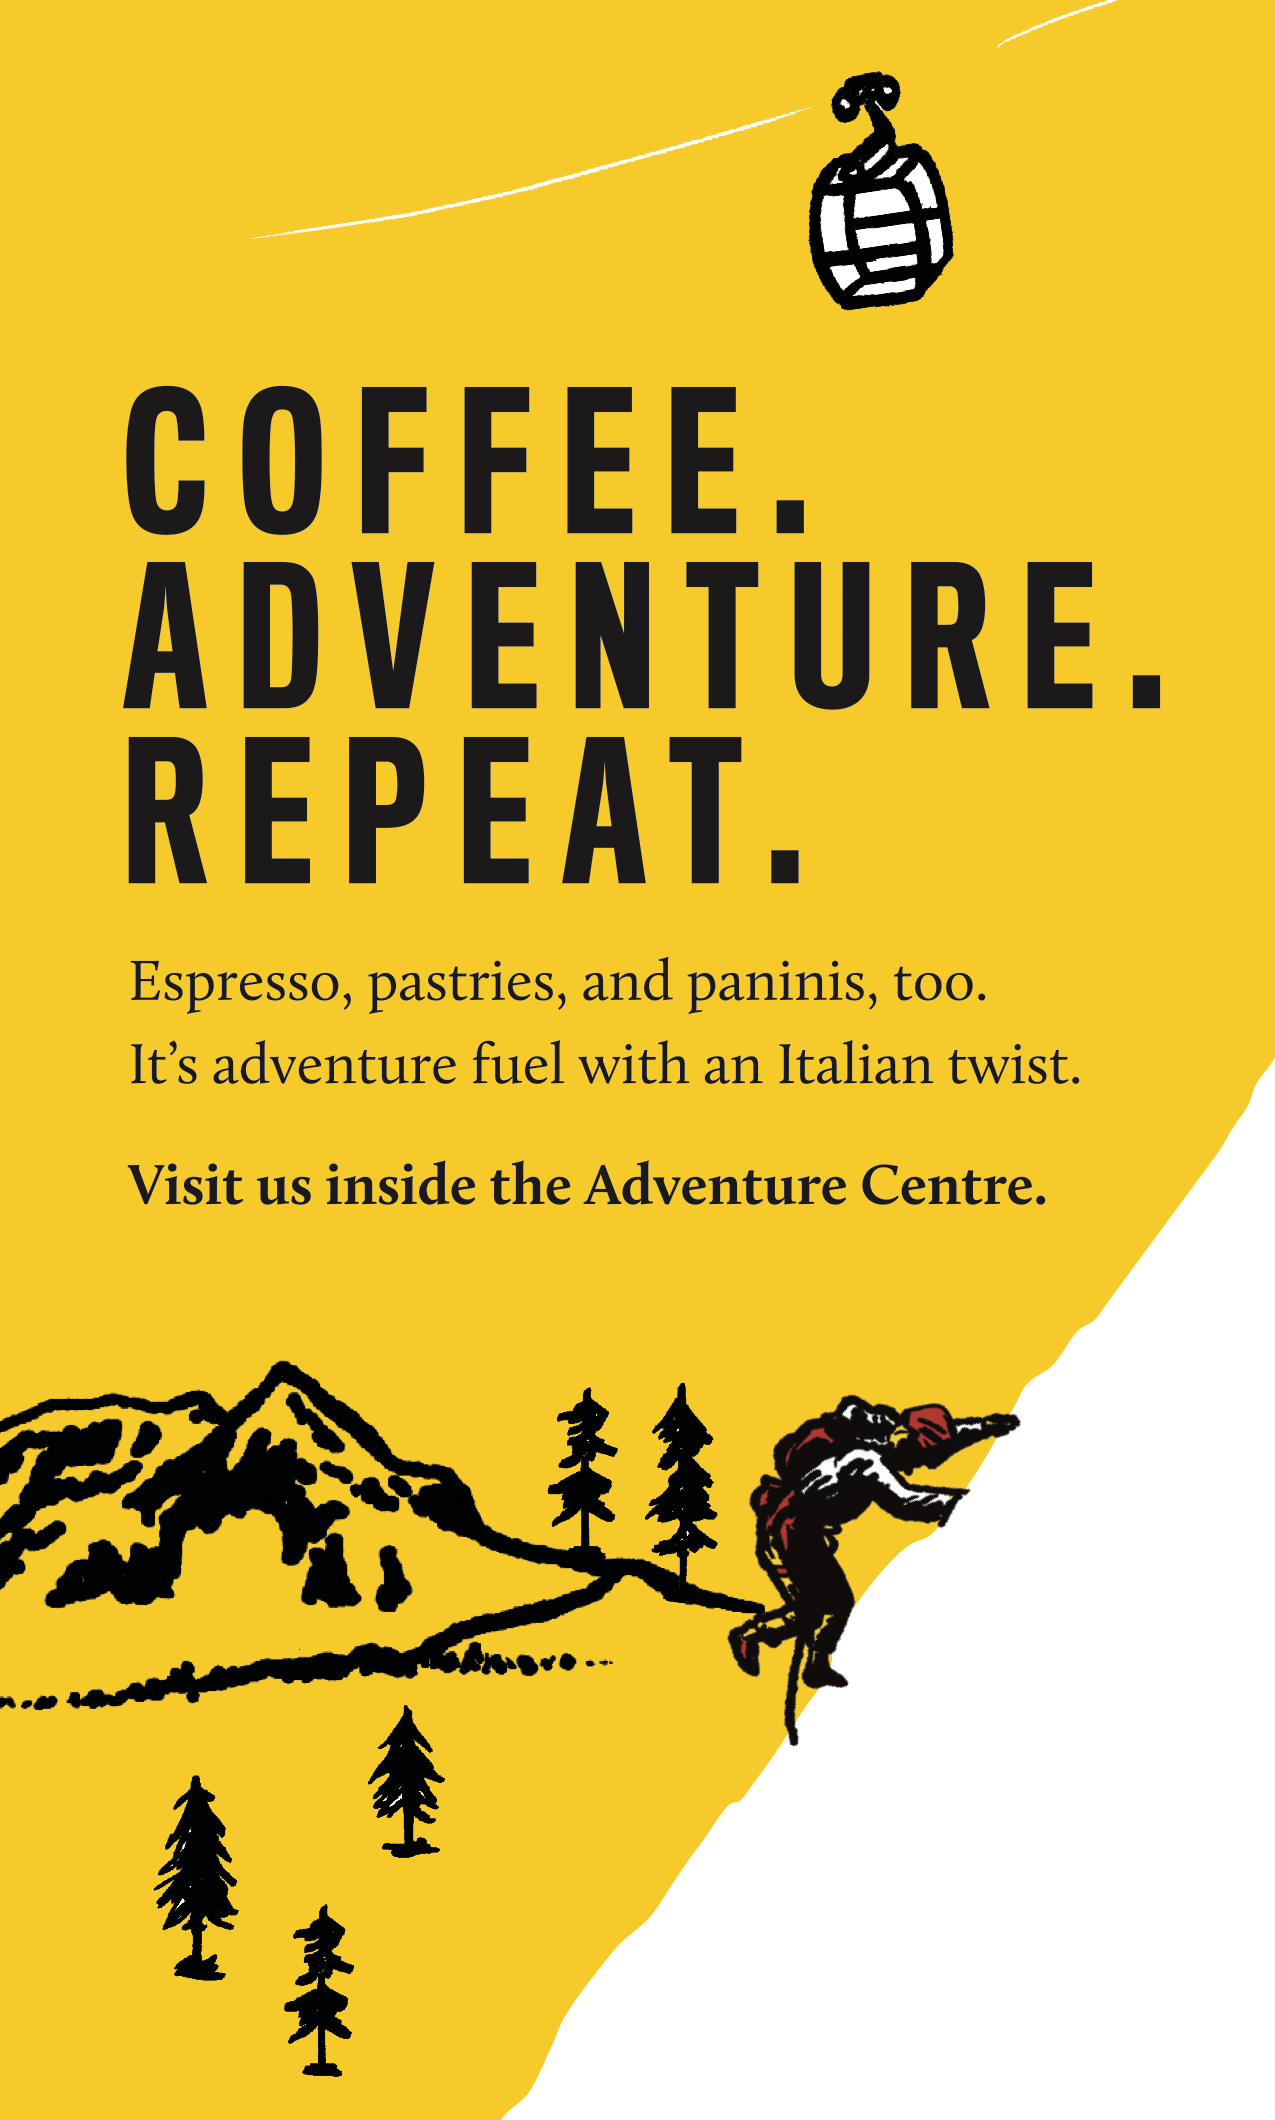 Summer Coffee in Squamish